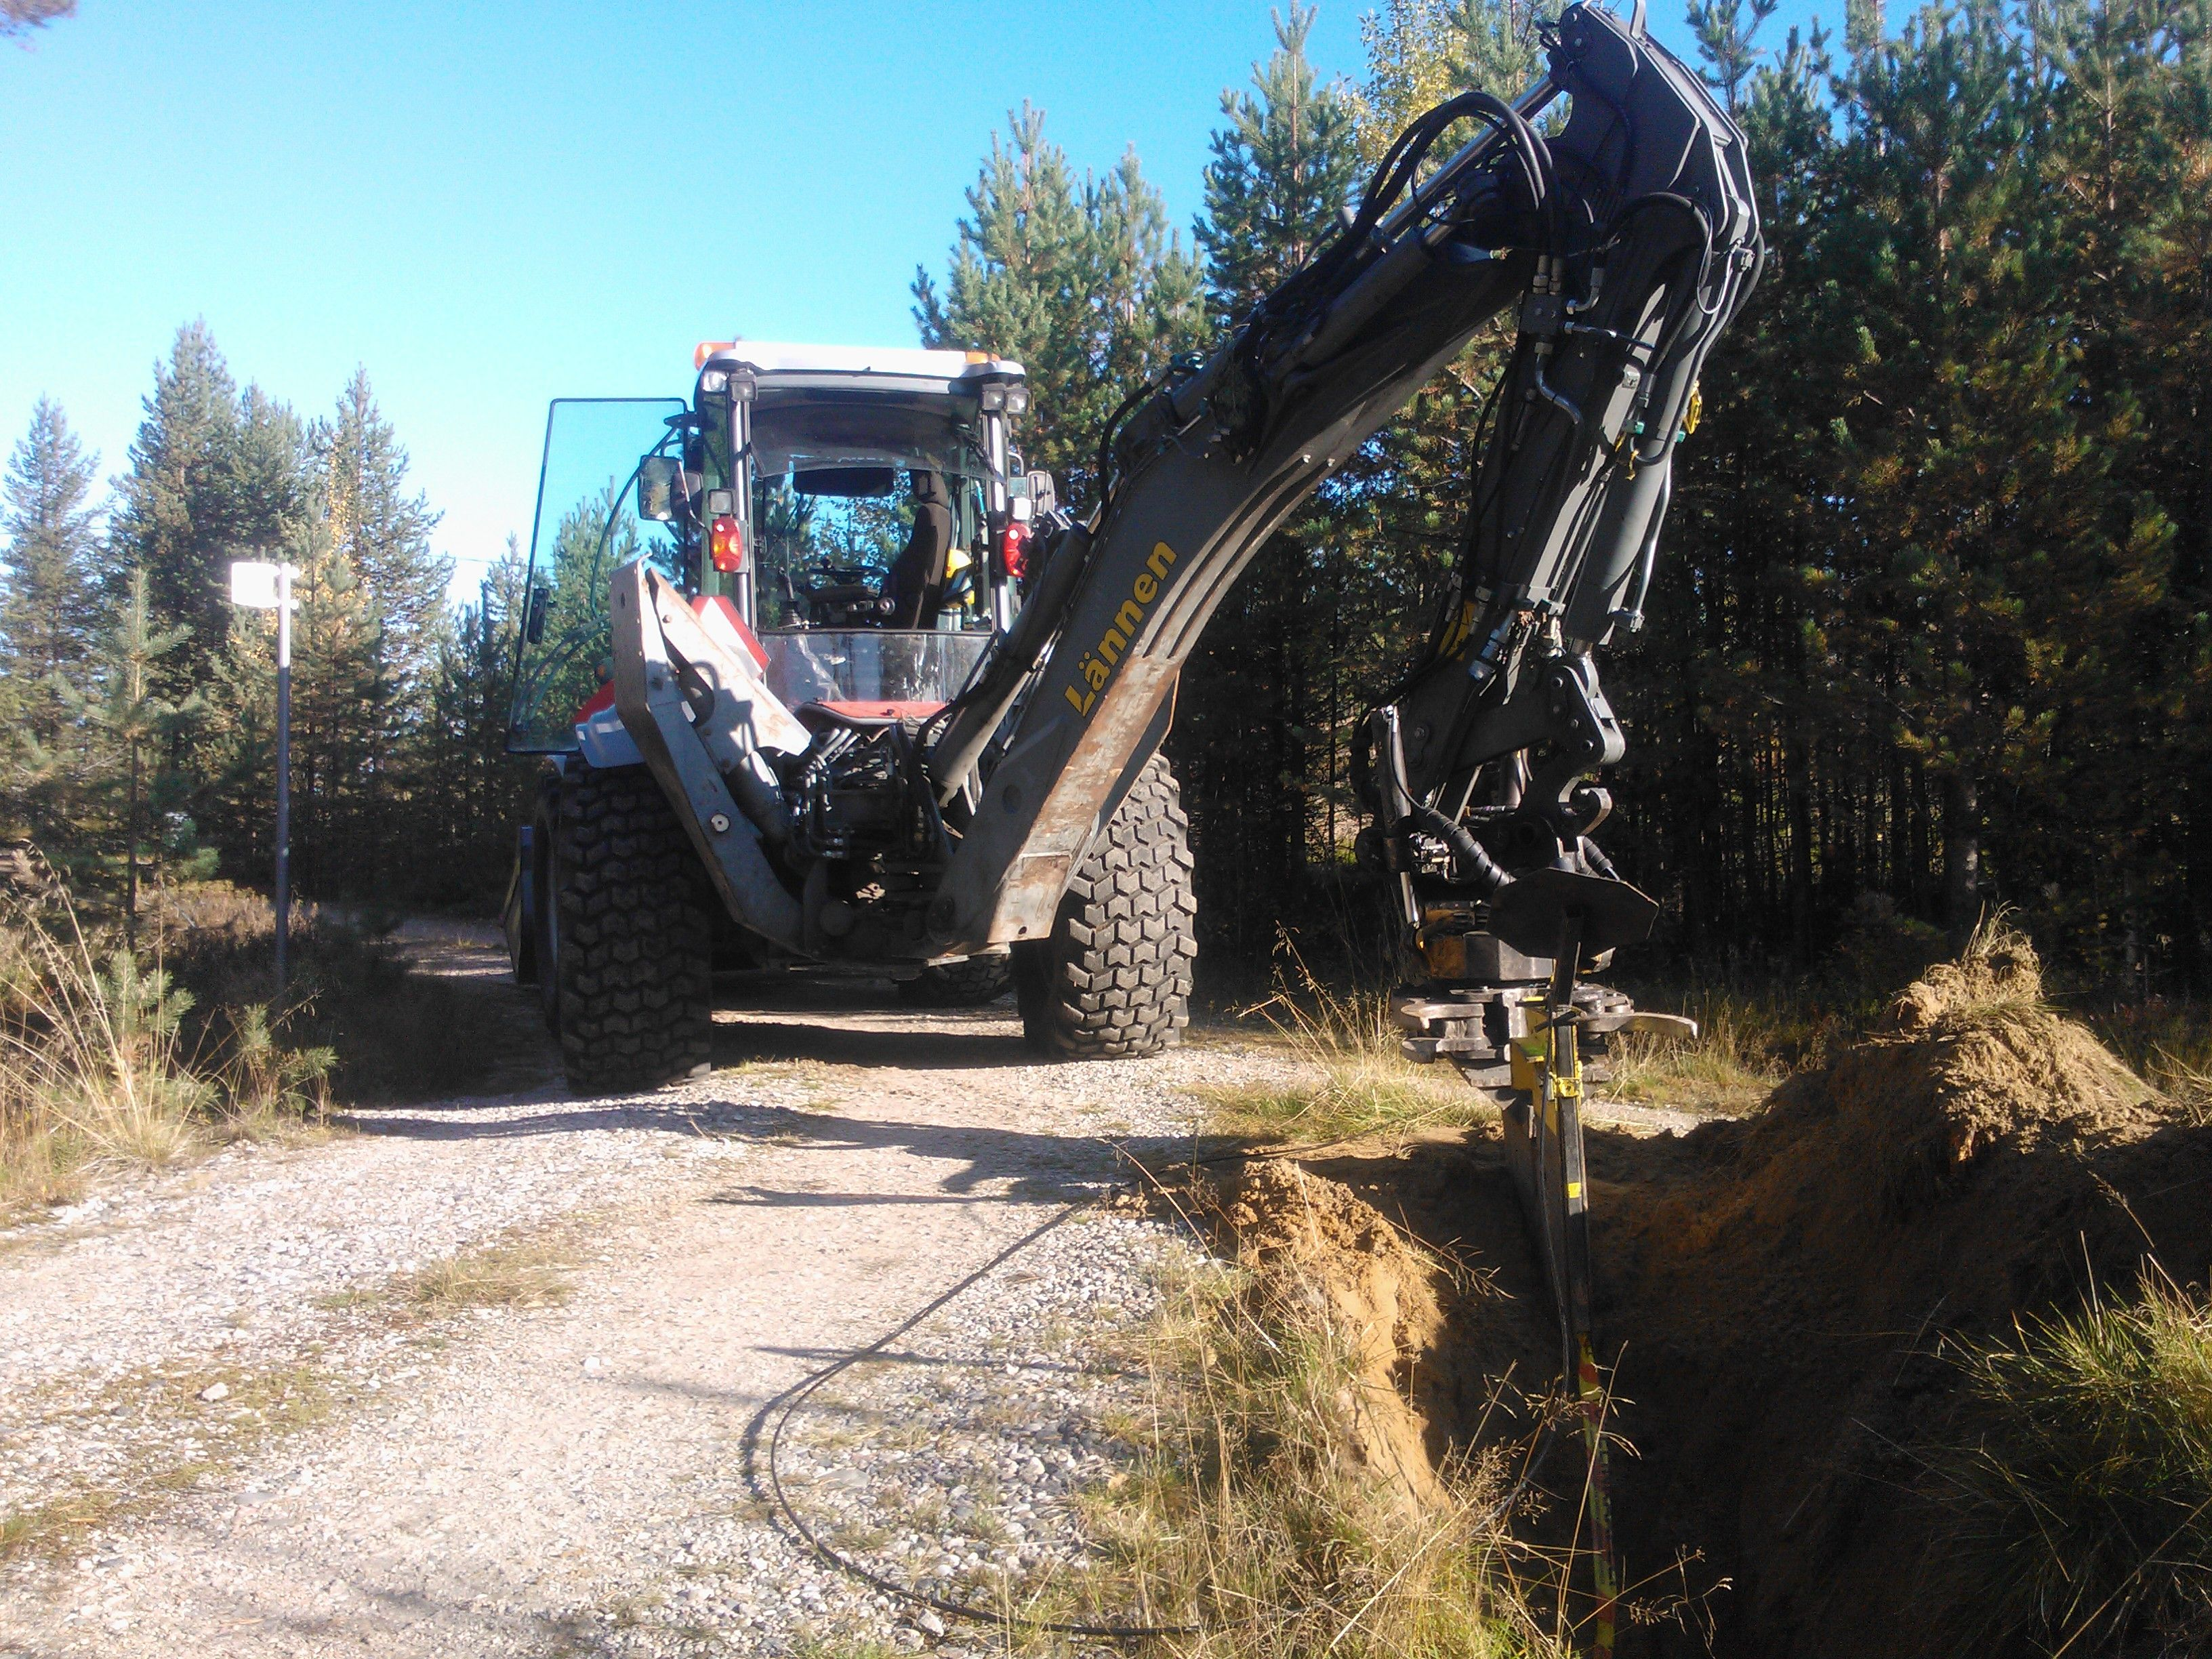 Kuusamon kaivu & kaapeli & Lännen 8600E  #Lannen #Lännen #backhoe #machine #municipal_works #infra #cable